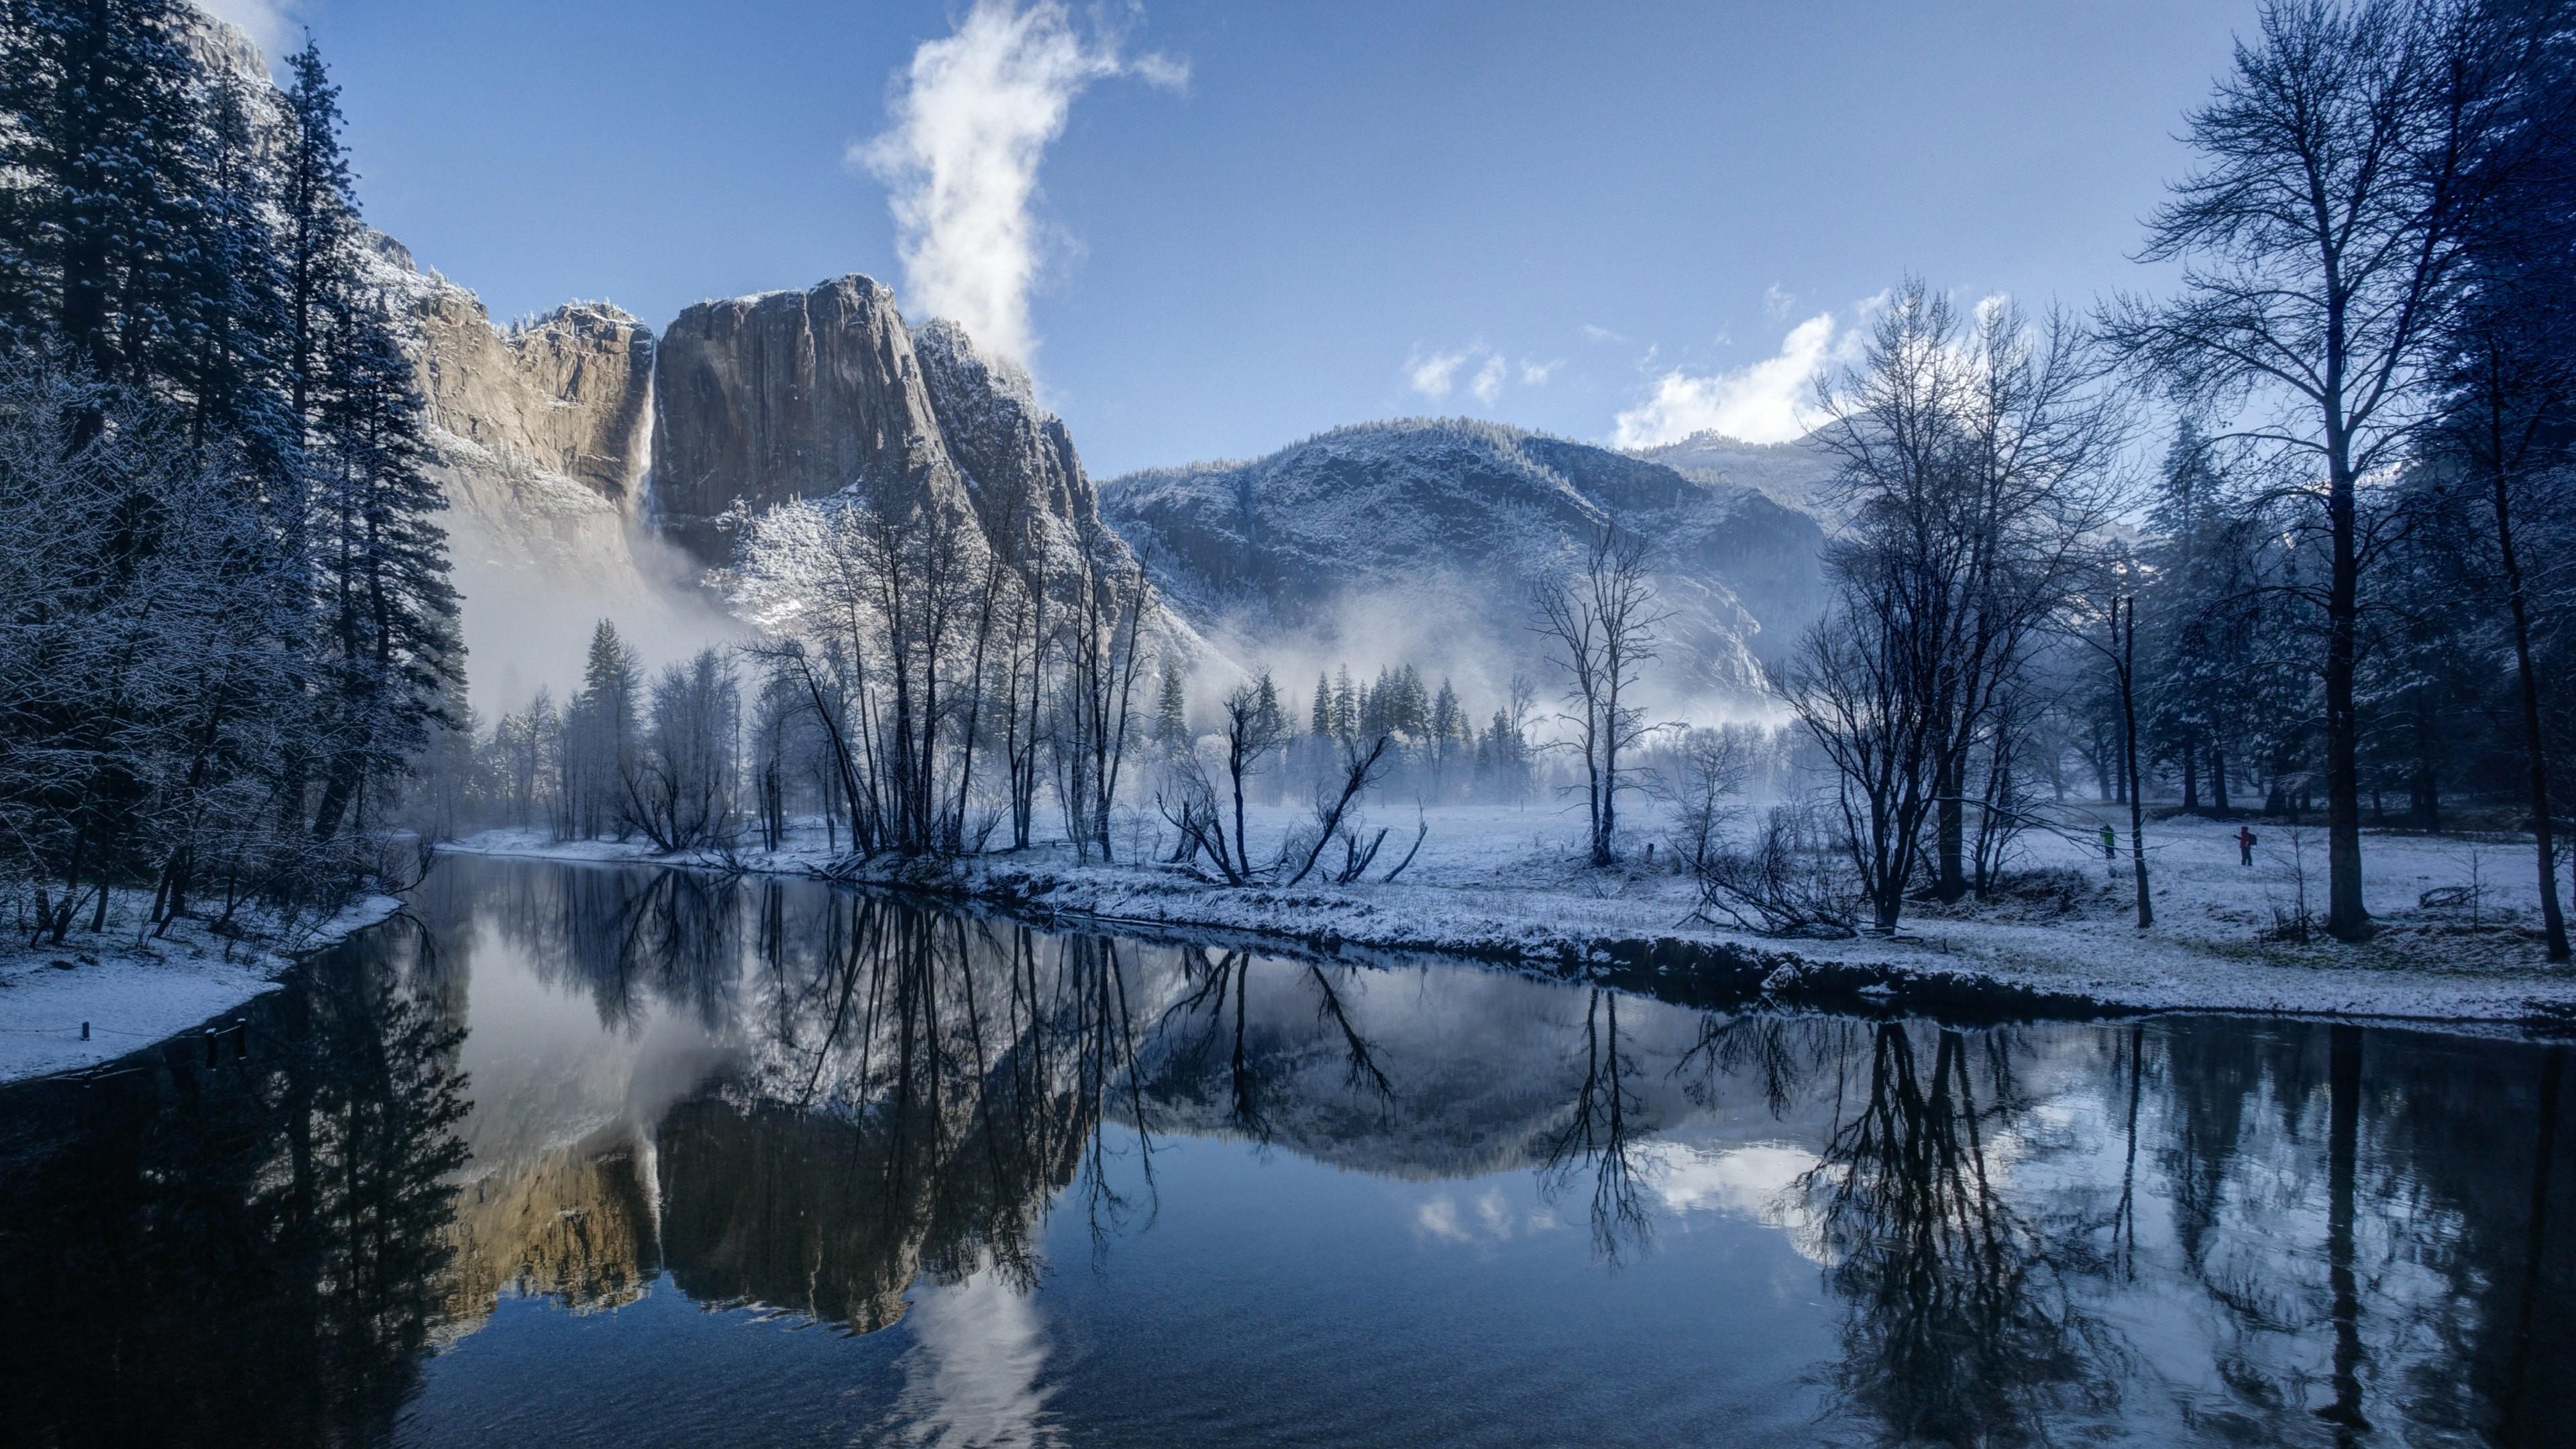 Merced River in Yosemite Valley (Yosemite National Park, CA) wallpaper